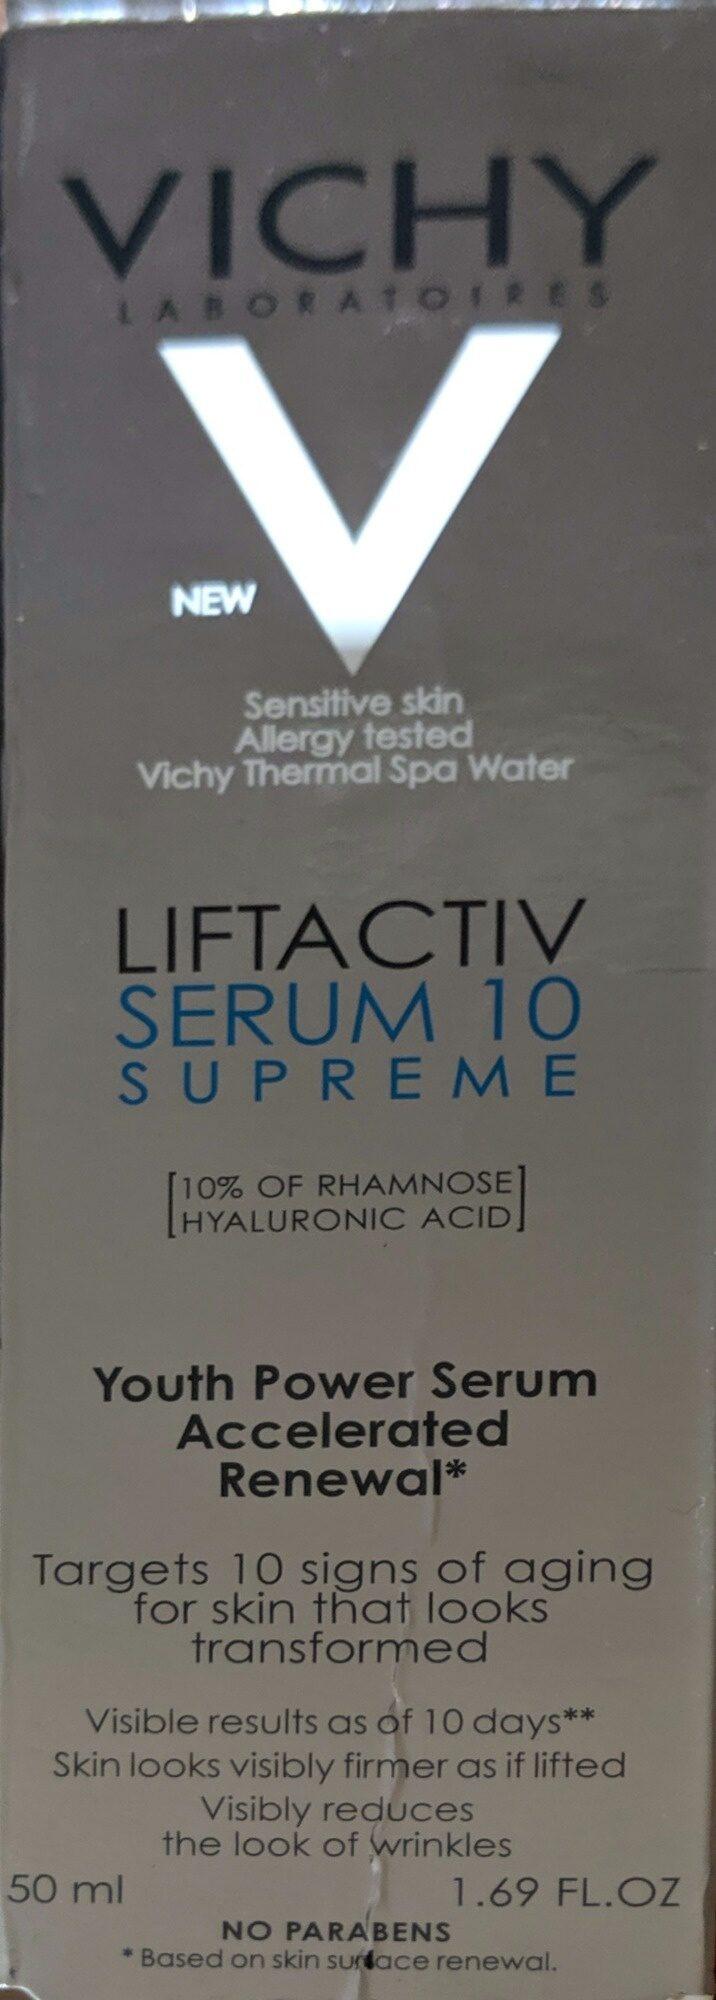 Liftactiv Serum 10 Supreme - Product